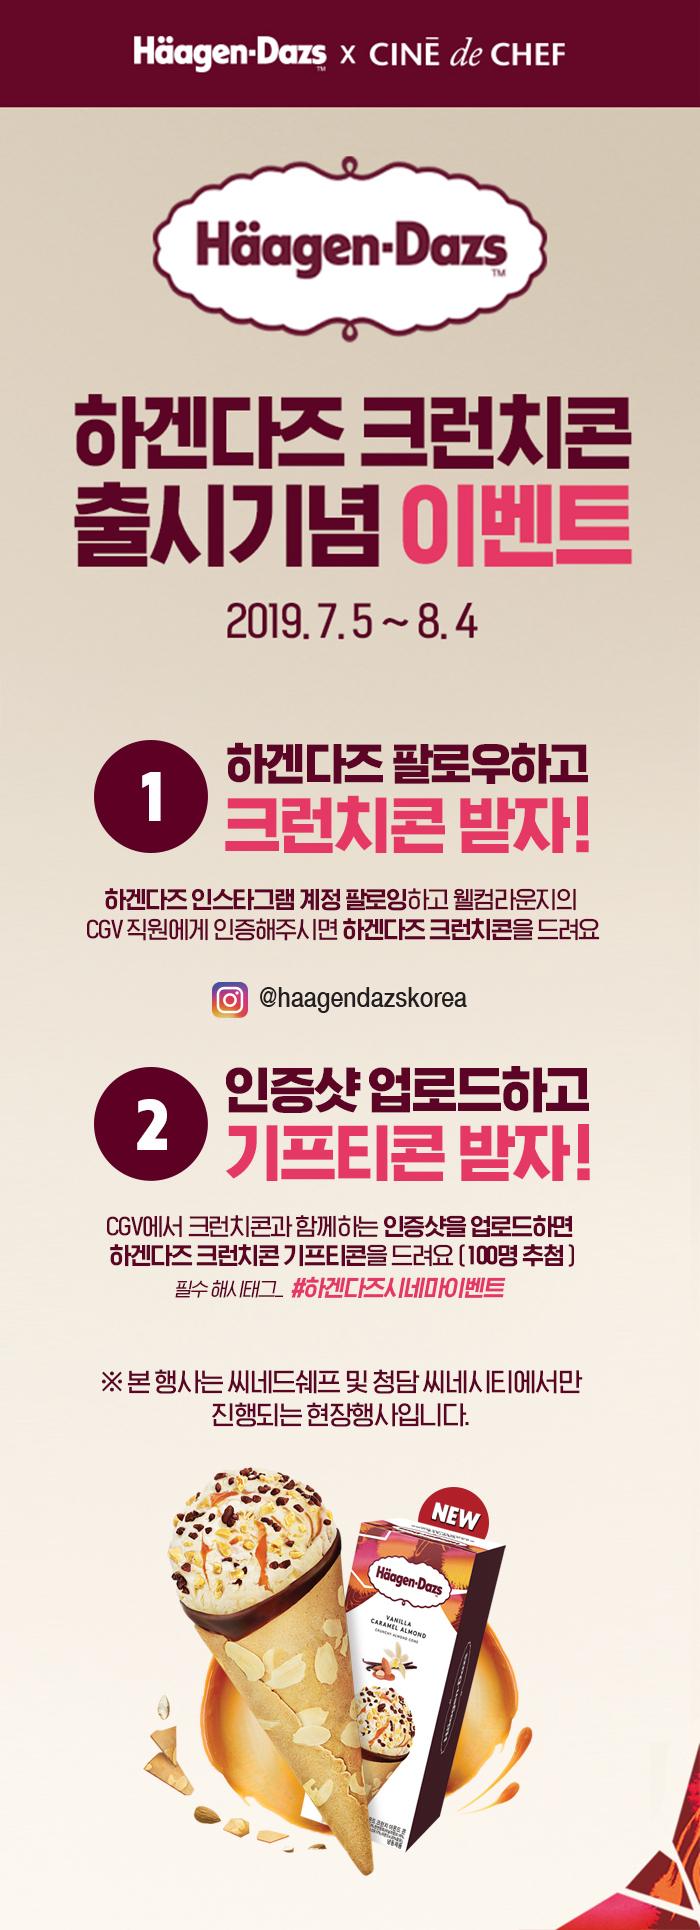 CGV극장별 [씨네드쉐프] 하겐다즈 크런치콘 출시기념 이벤트!